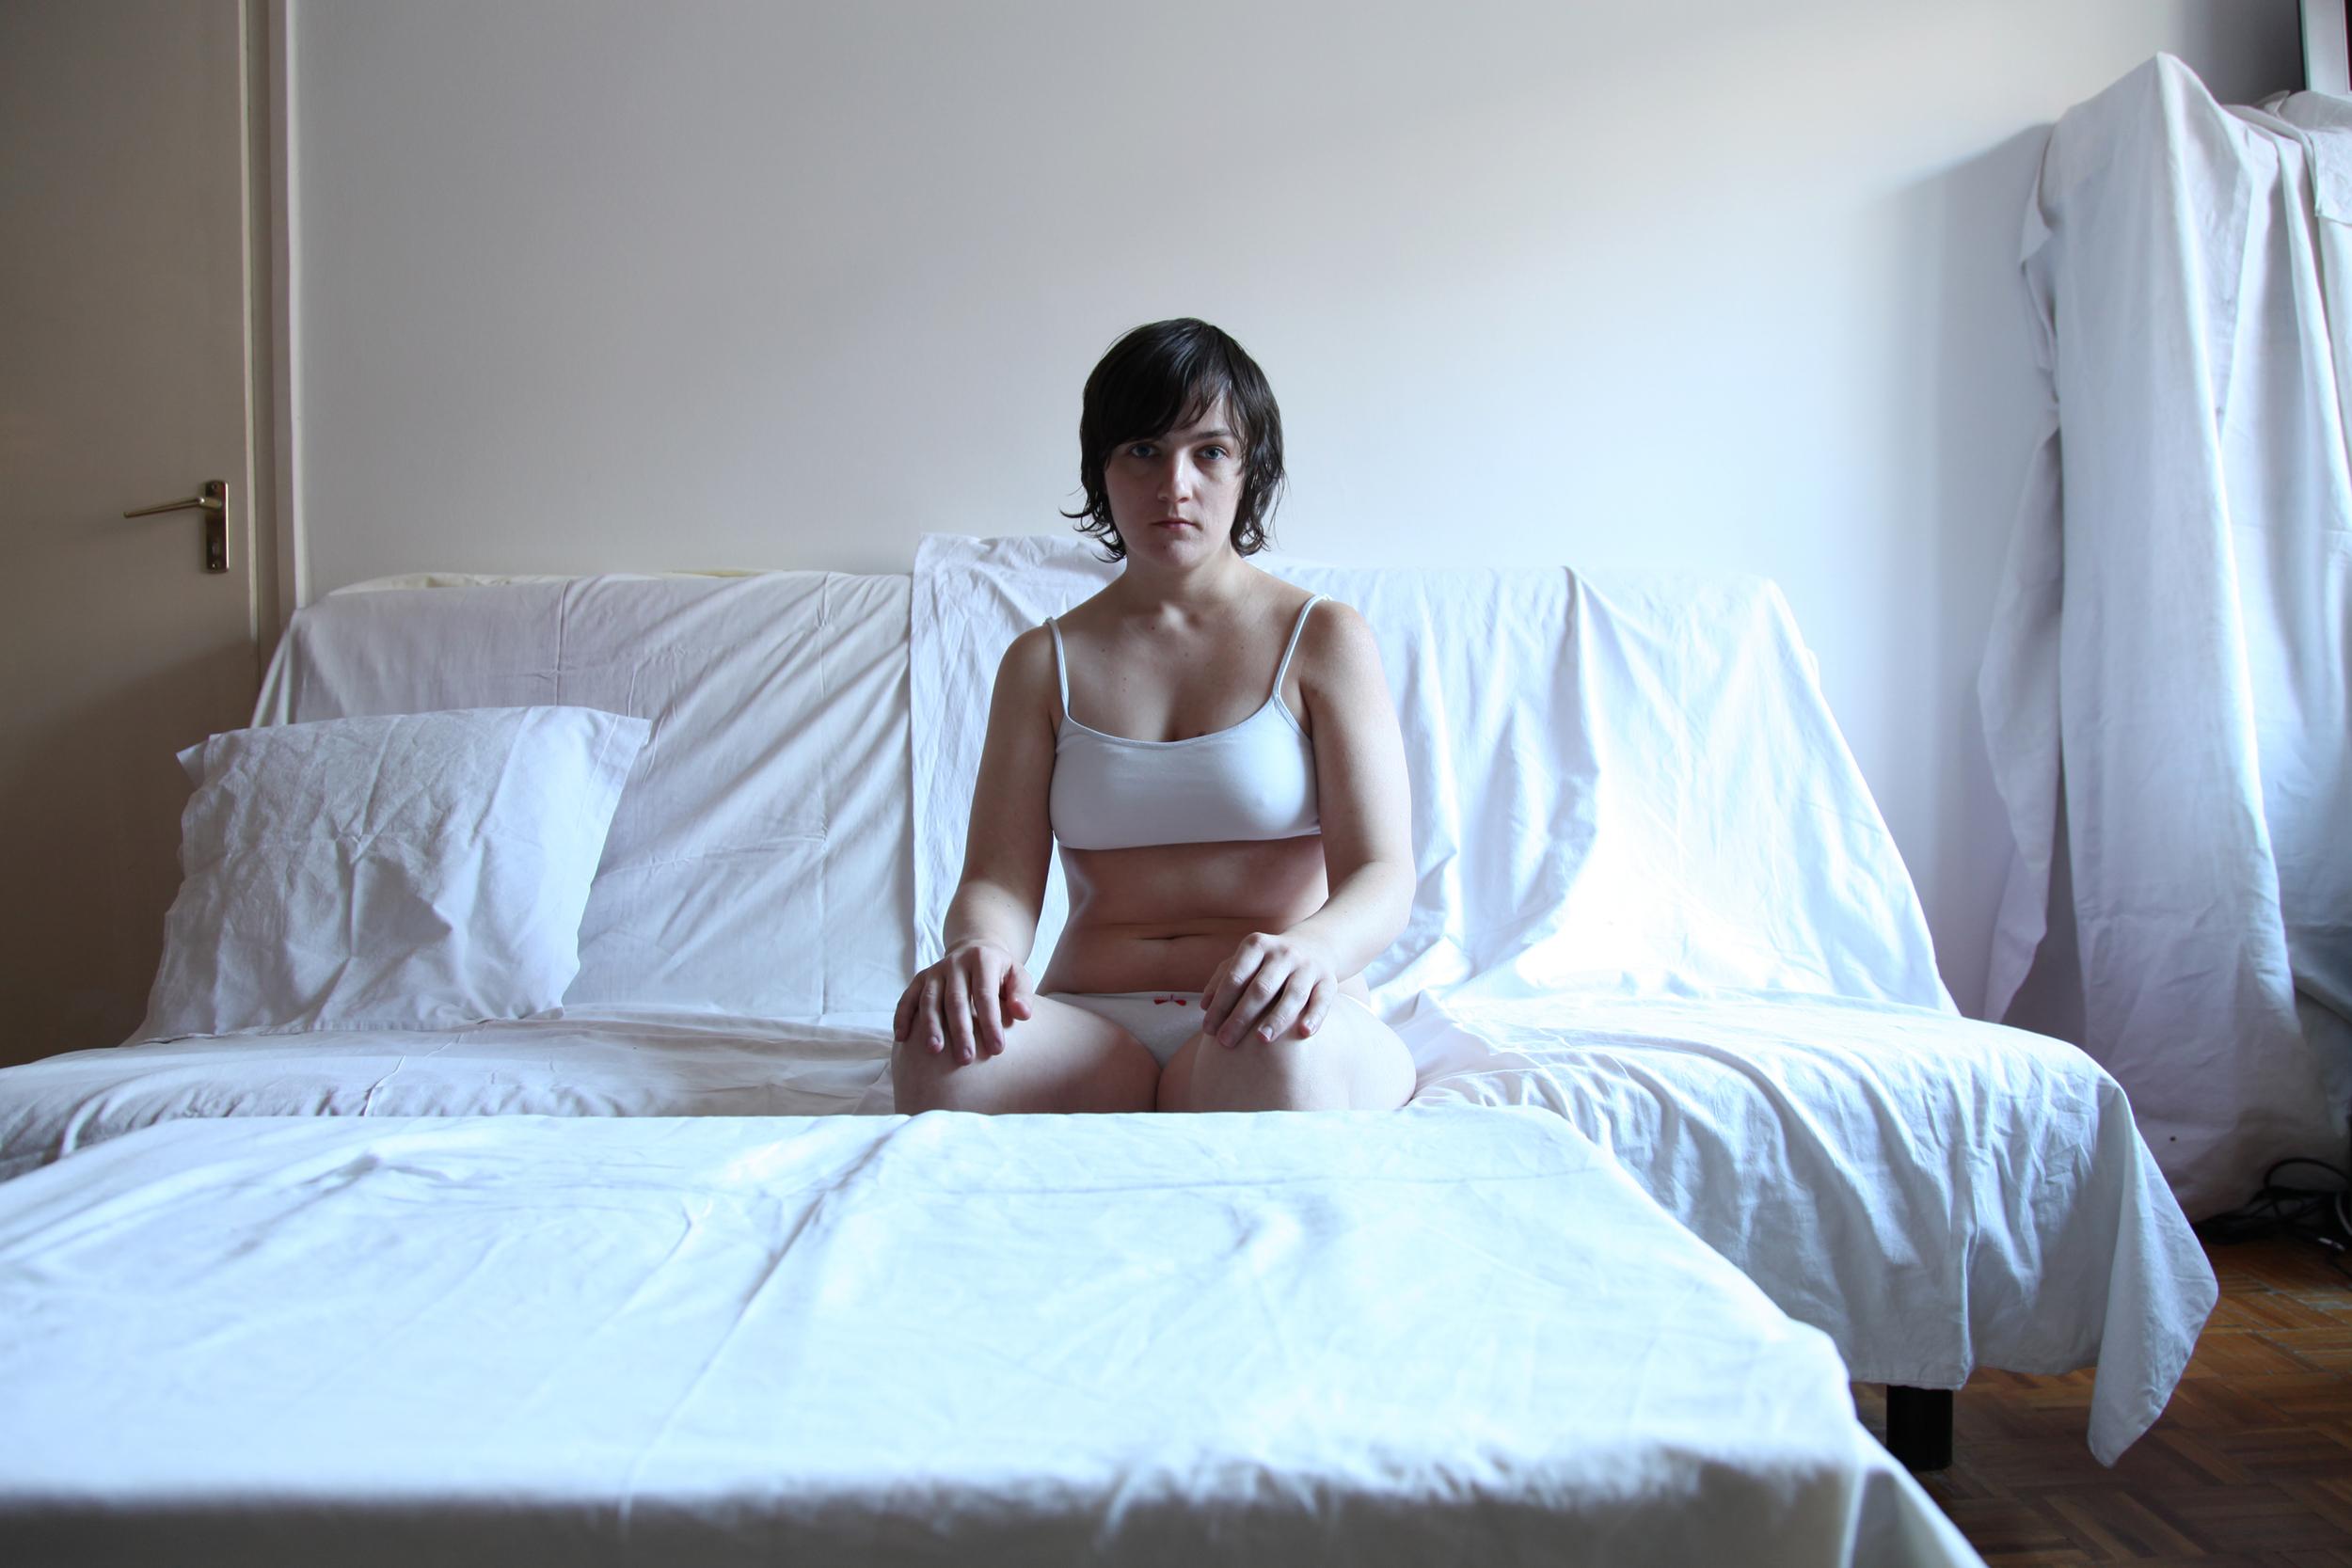 annagyurkovics-untitled-03